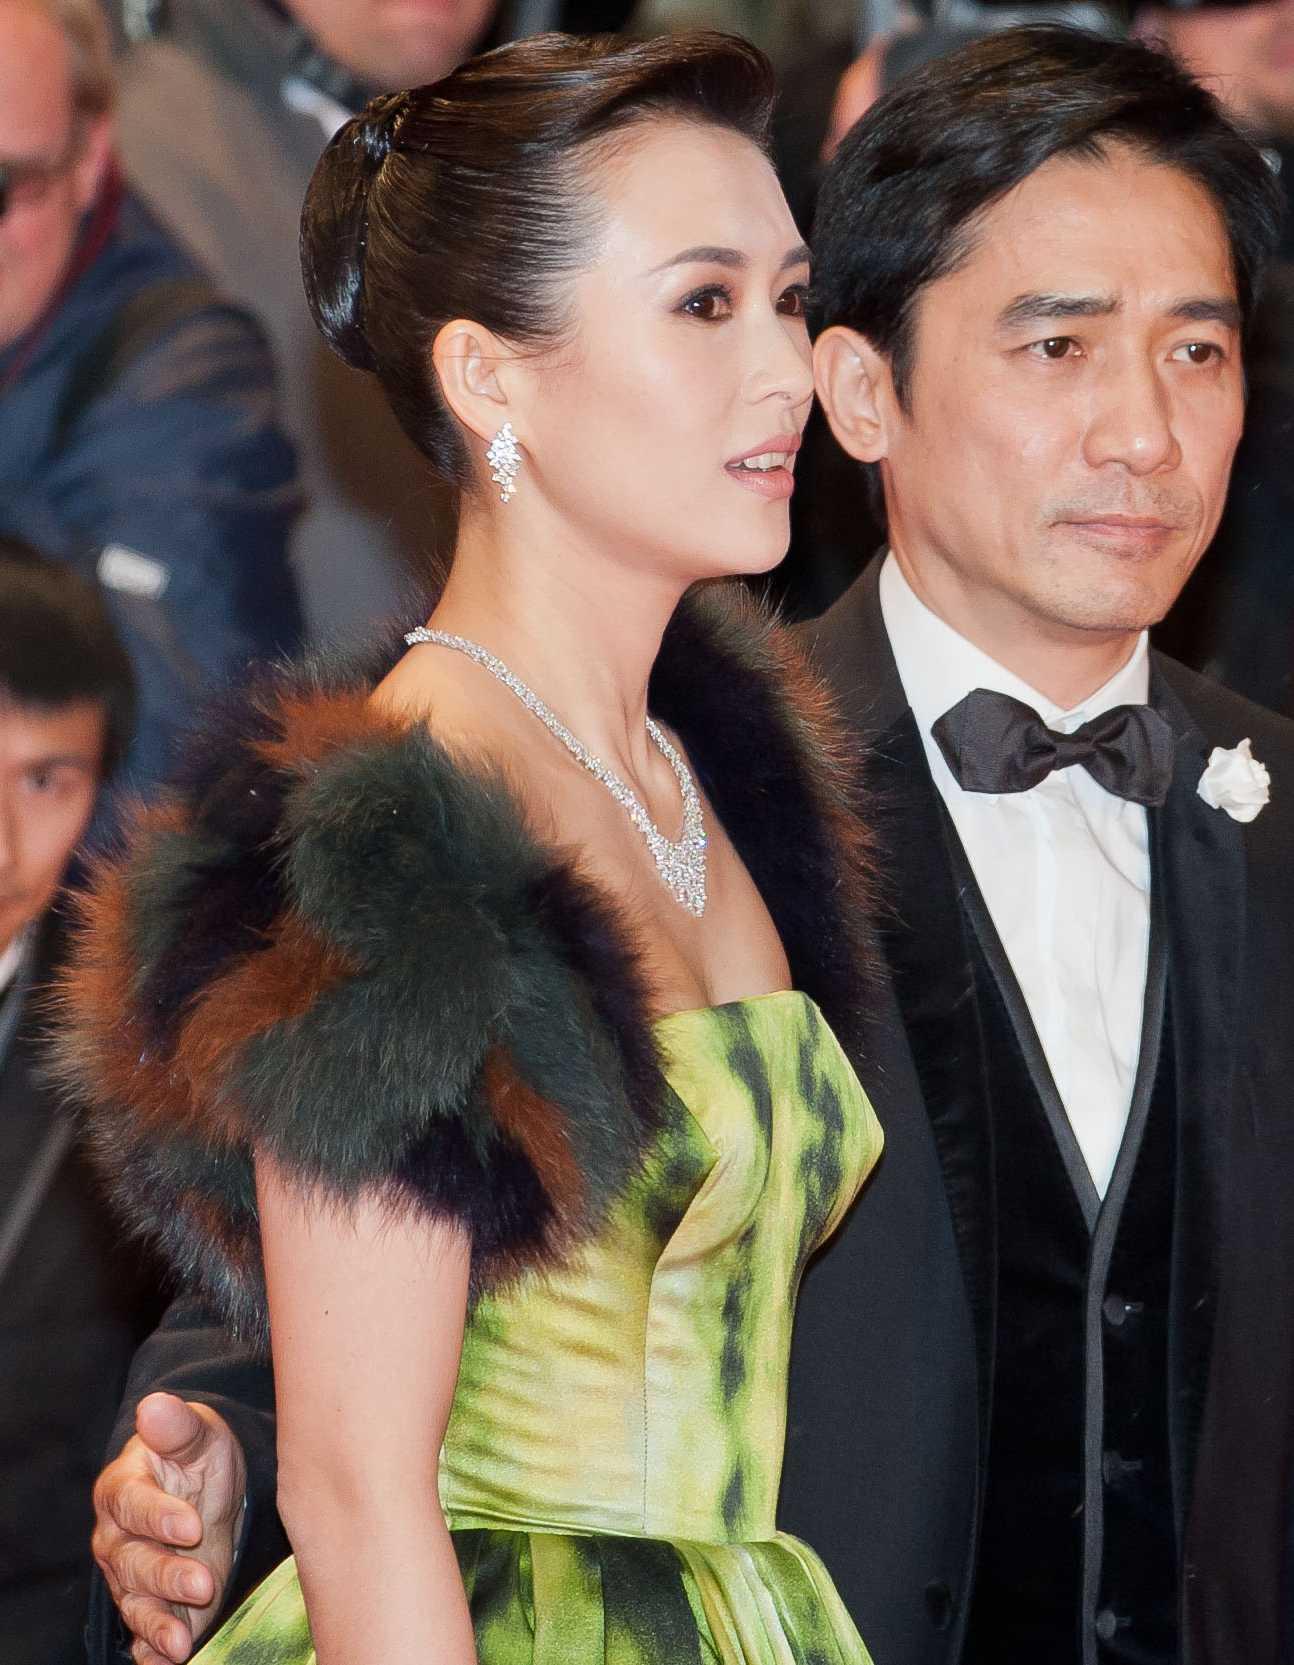 zhang ziyi dating 2013